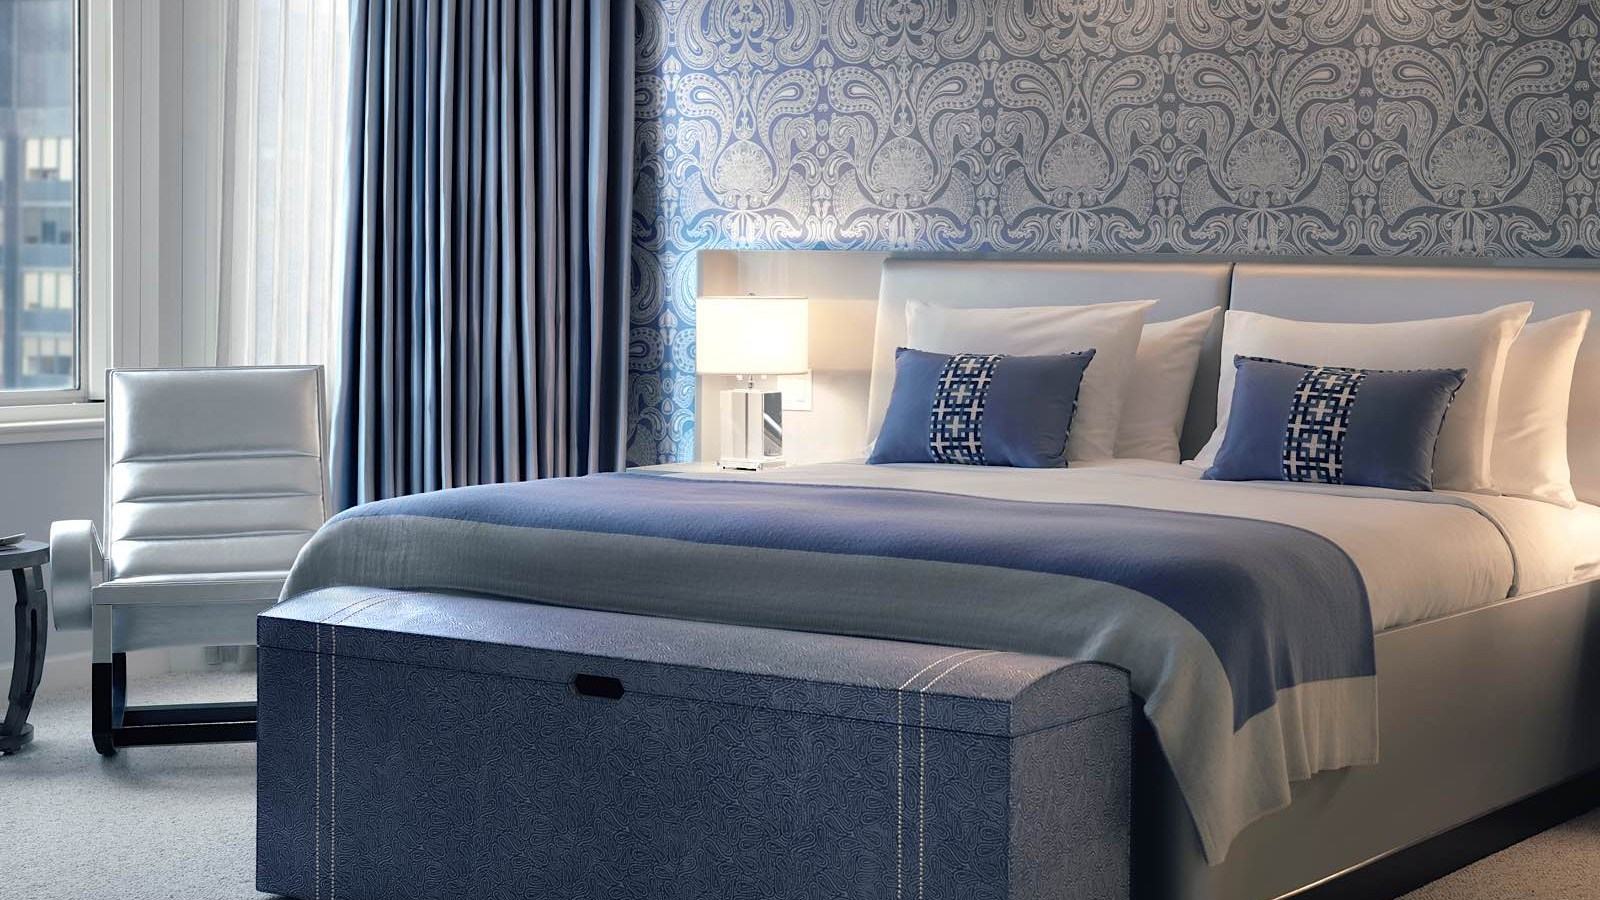 the fanciest hotels in nyc frugal frolicker. Black Bedroom Furniture Sets. Home Design Ideas